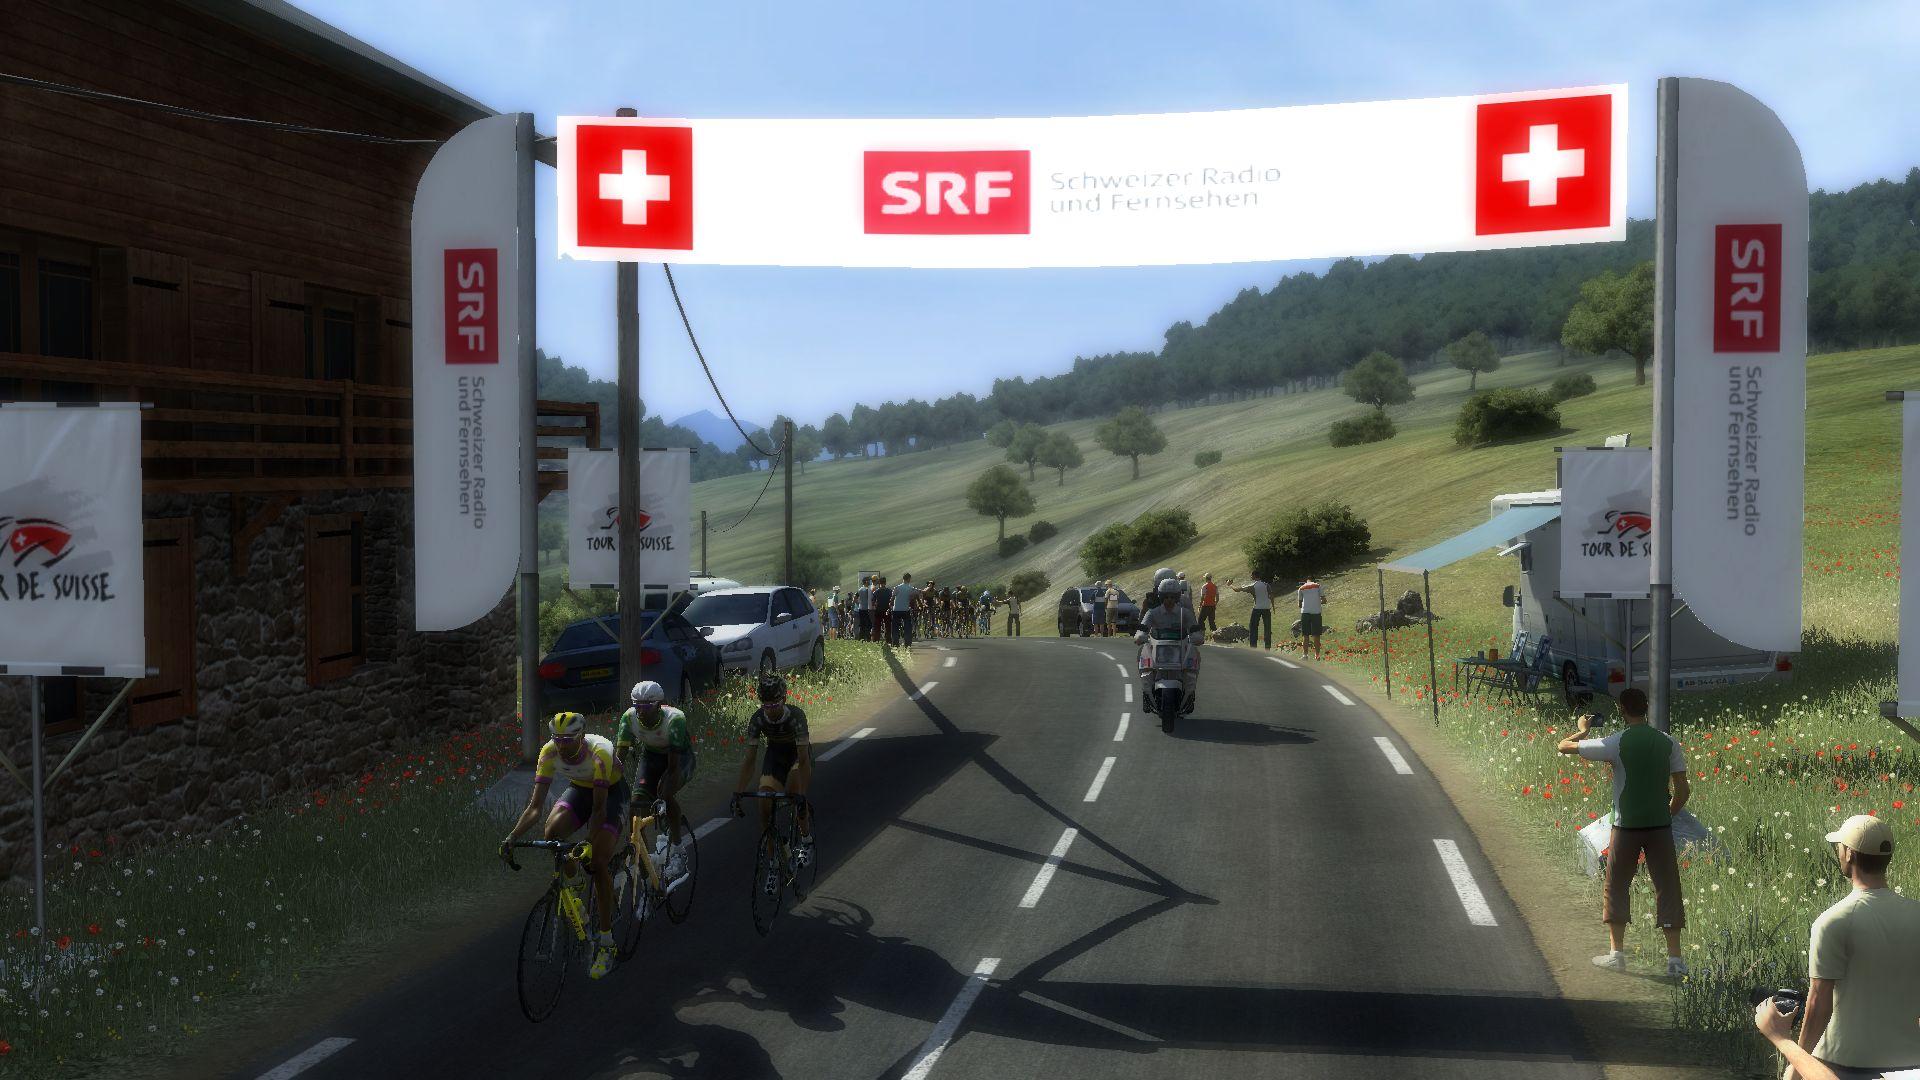 pcmdaily.com/images/mg/2017/Races/U23/Avenir/AVES7%205.jpg